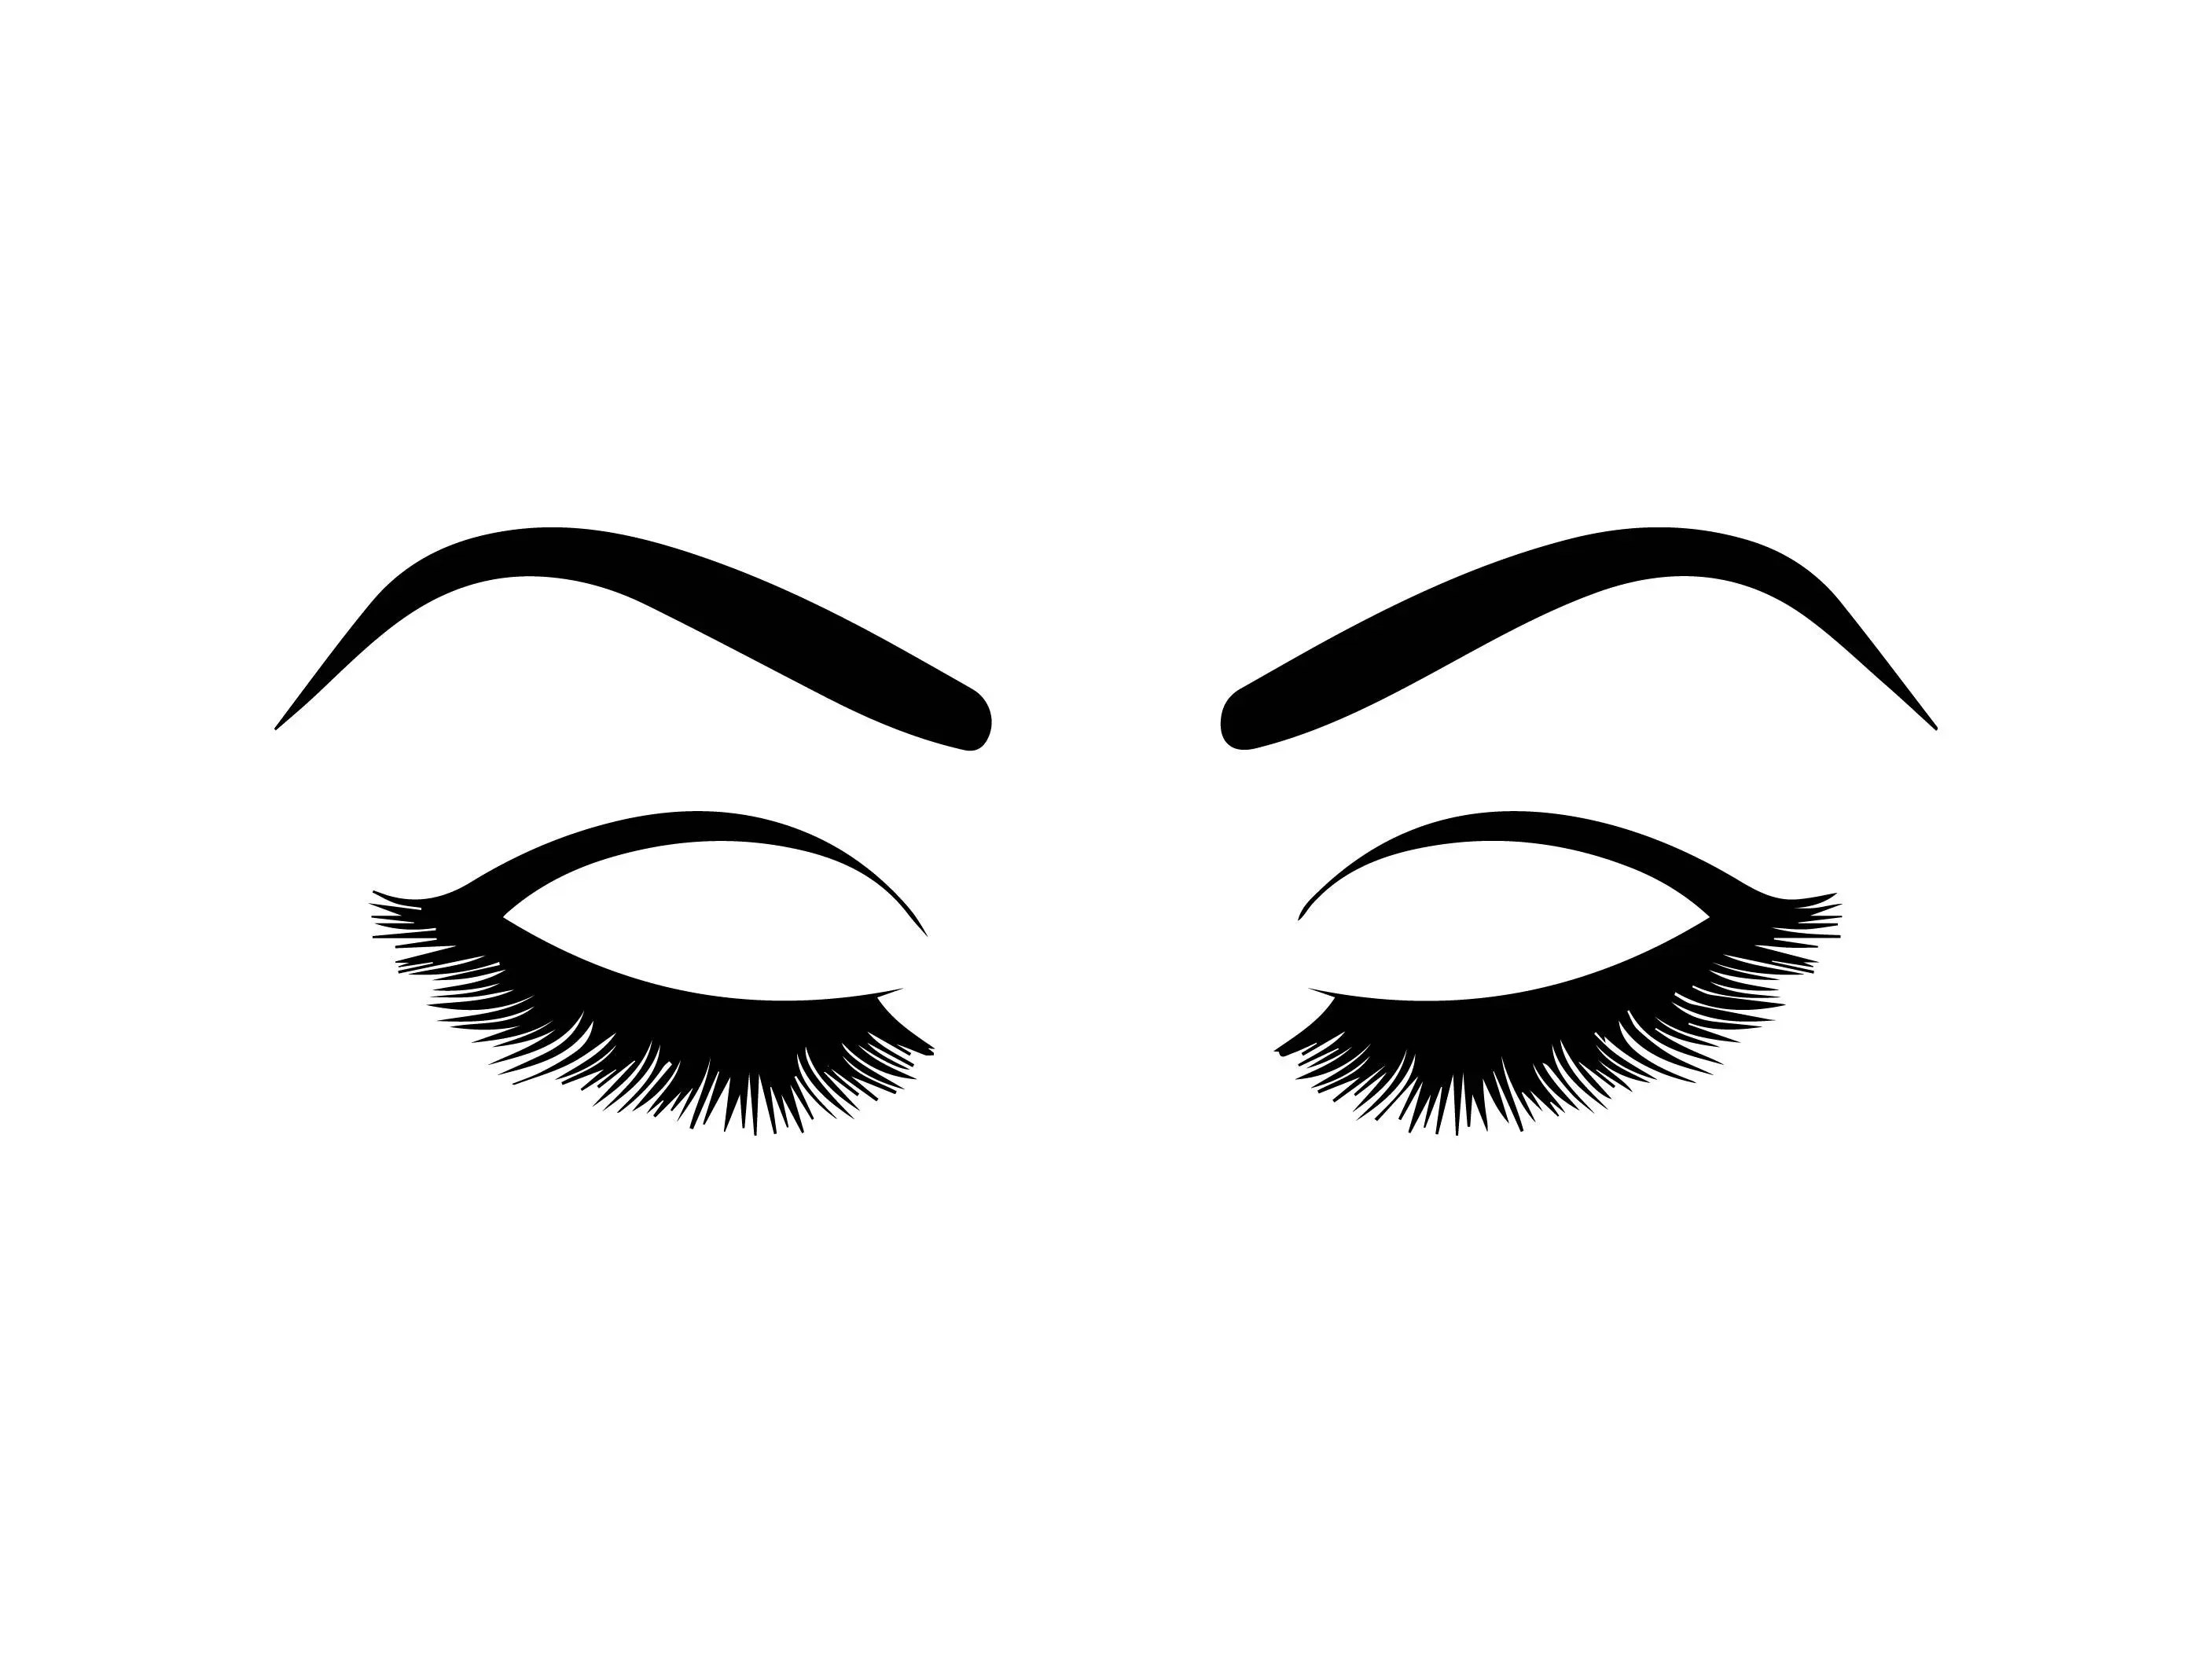 Make Your Own Monogram Iphone Wallpaper Eyebrow Eyelashes Vision Human Female Ojos Sign Eyeball See